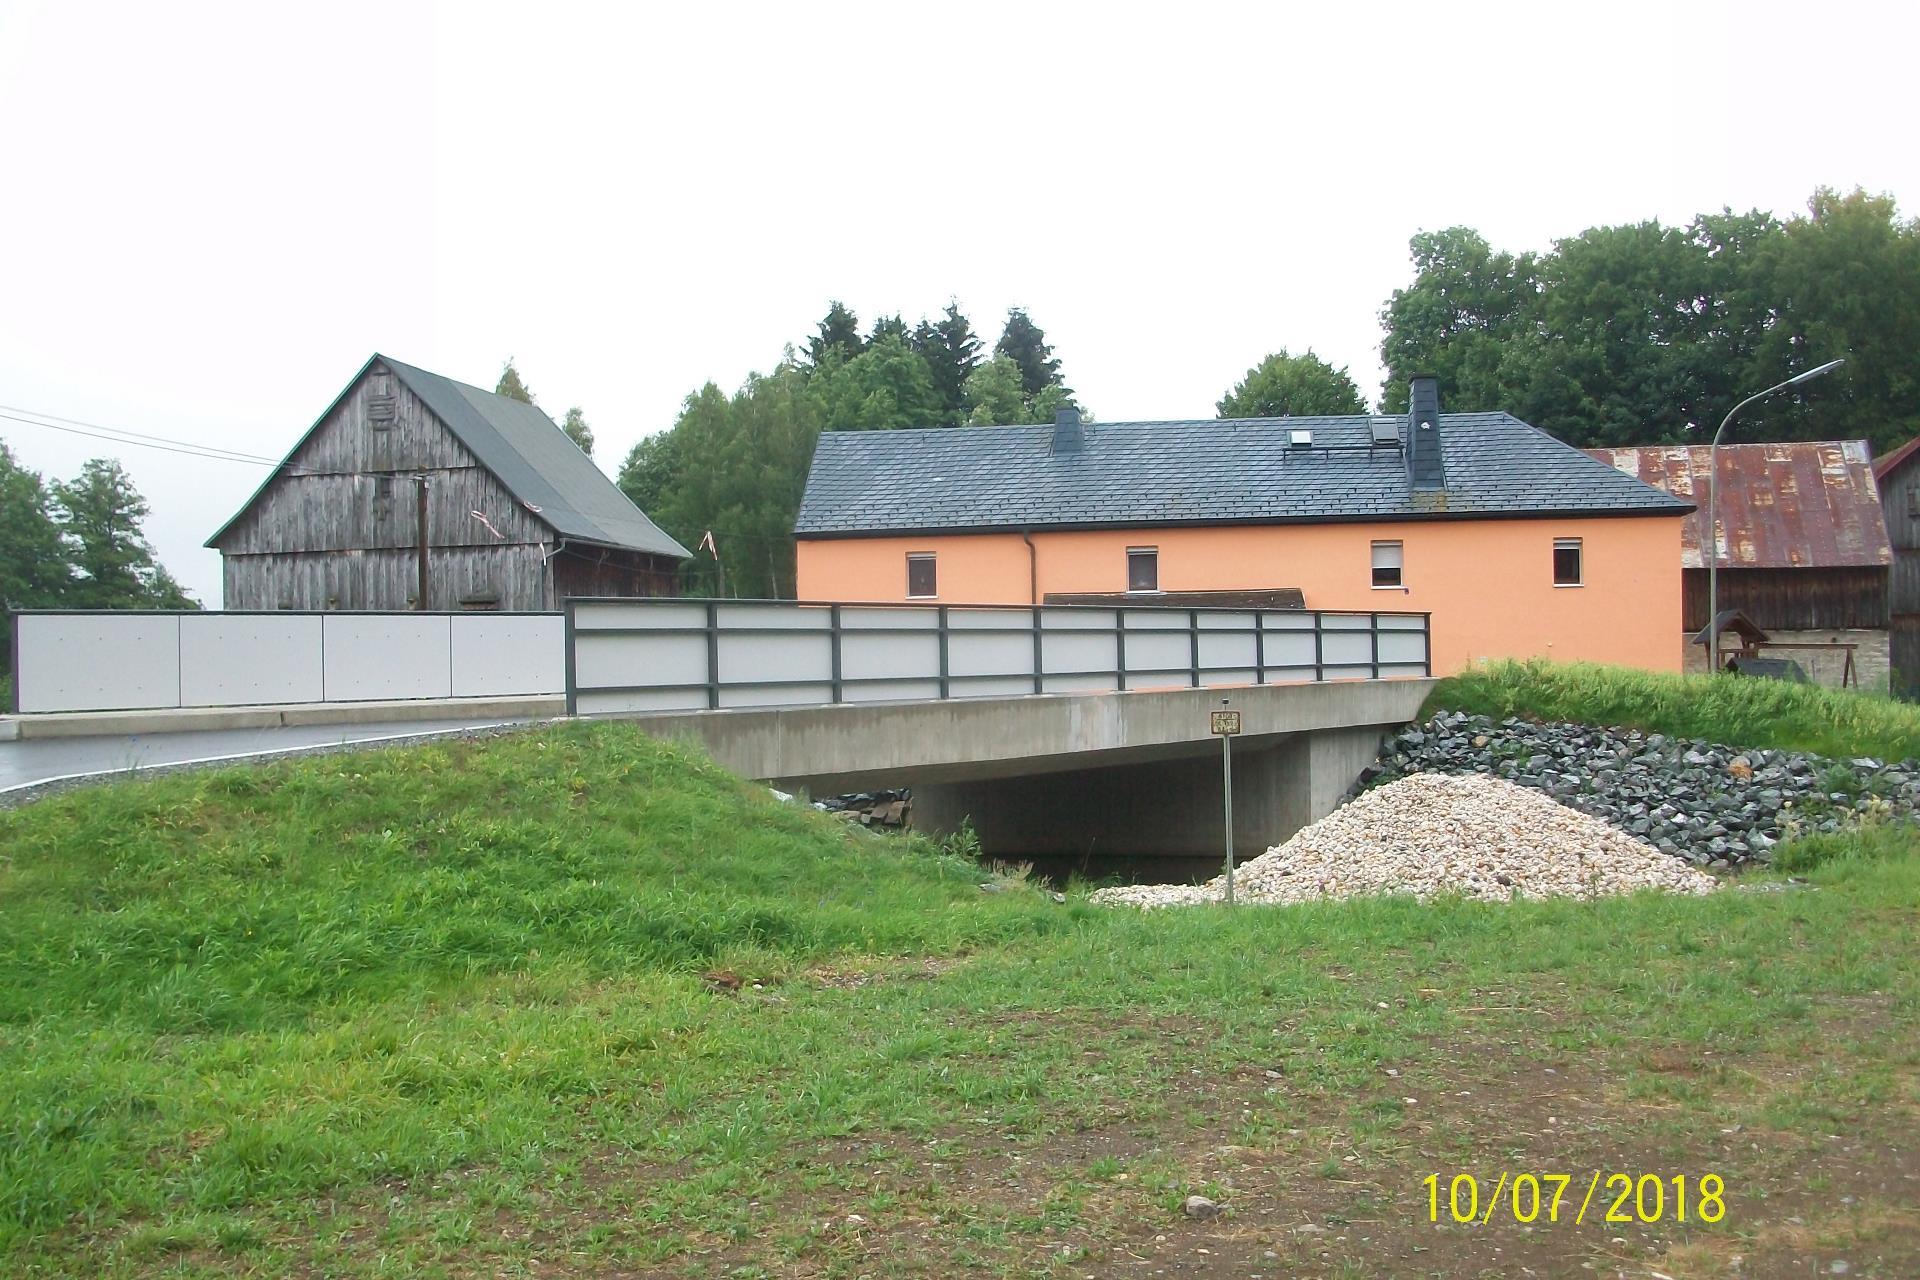 1-06 Regnitzlosau-1900